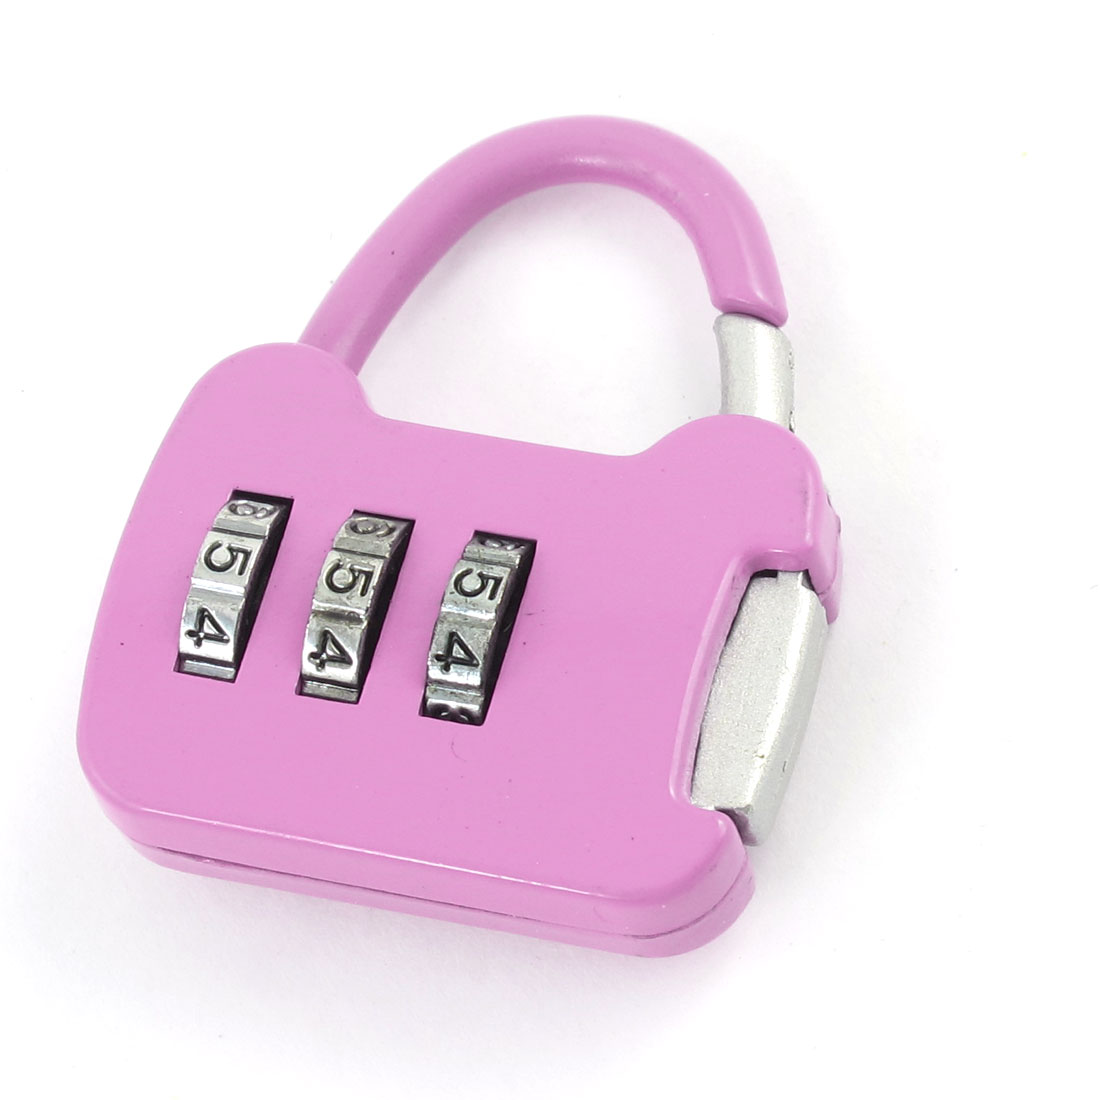 Travel Pink Plastic Luggage Suitcase Bag Code Lock Padlock